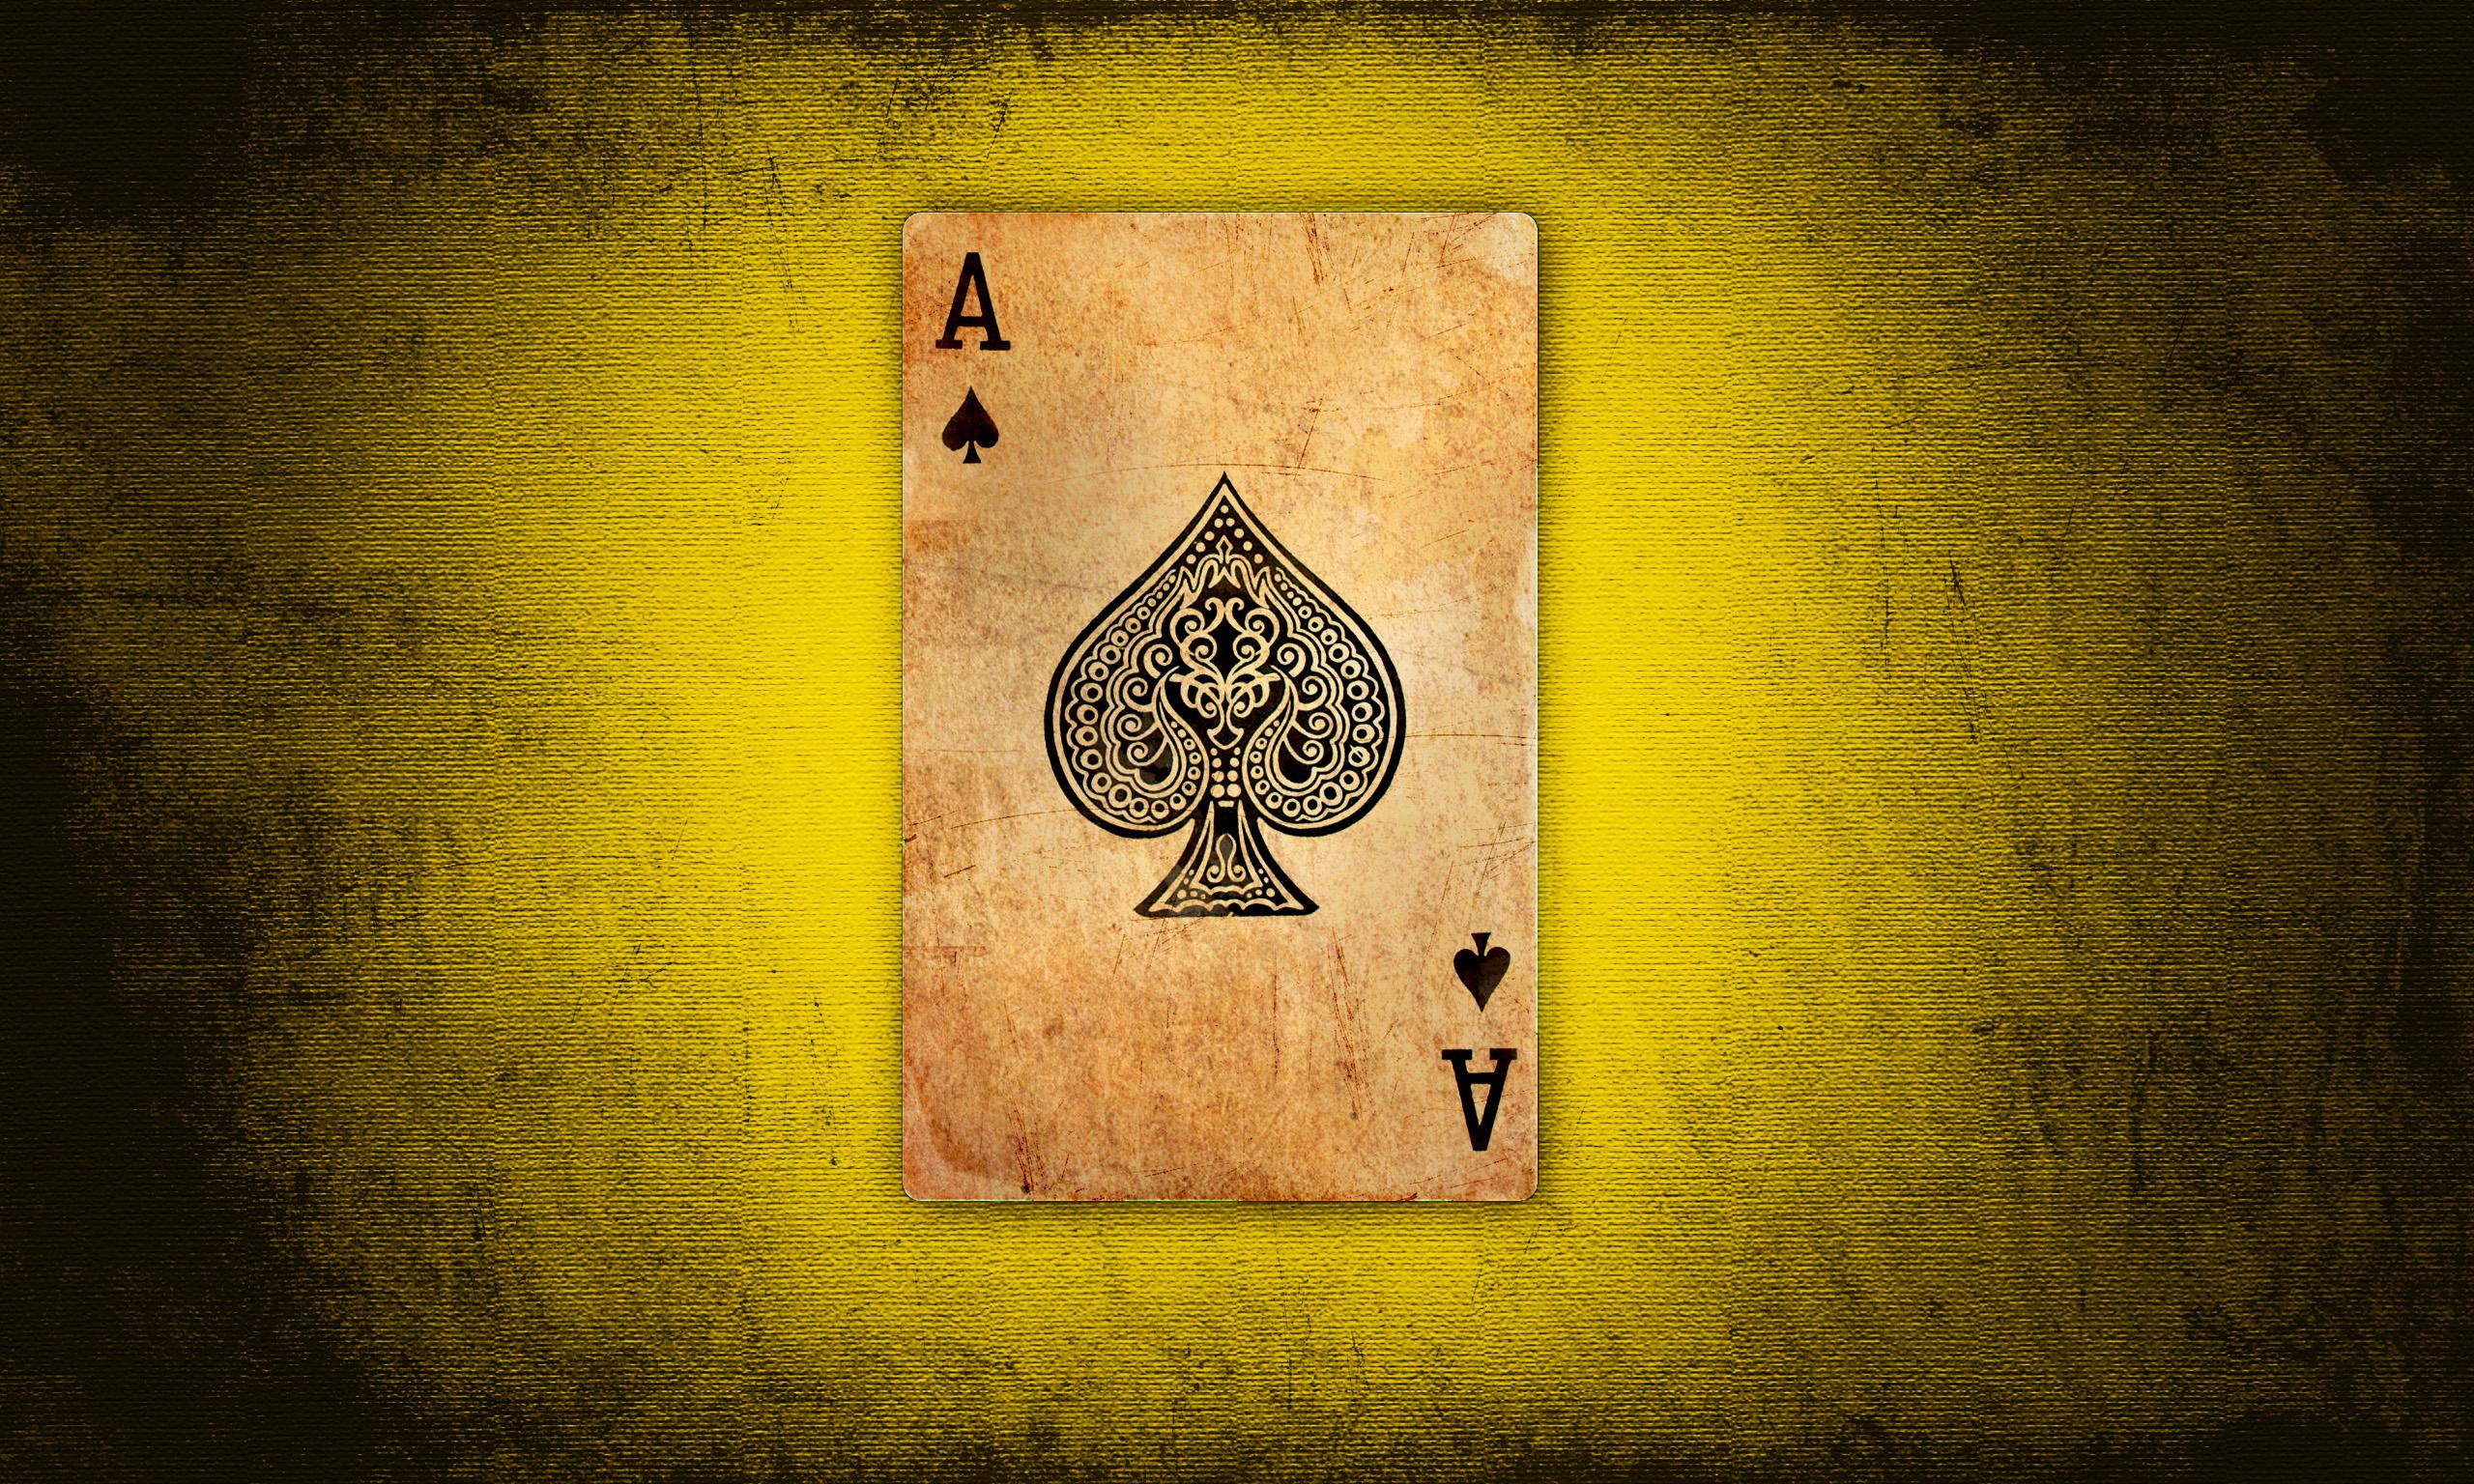 46 Ace Of Spades Wallpaper Hd On Wallpapersafari